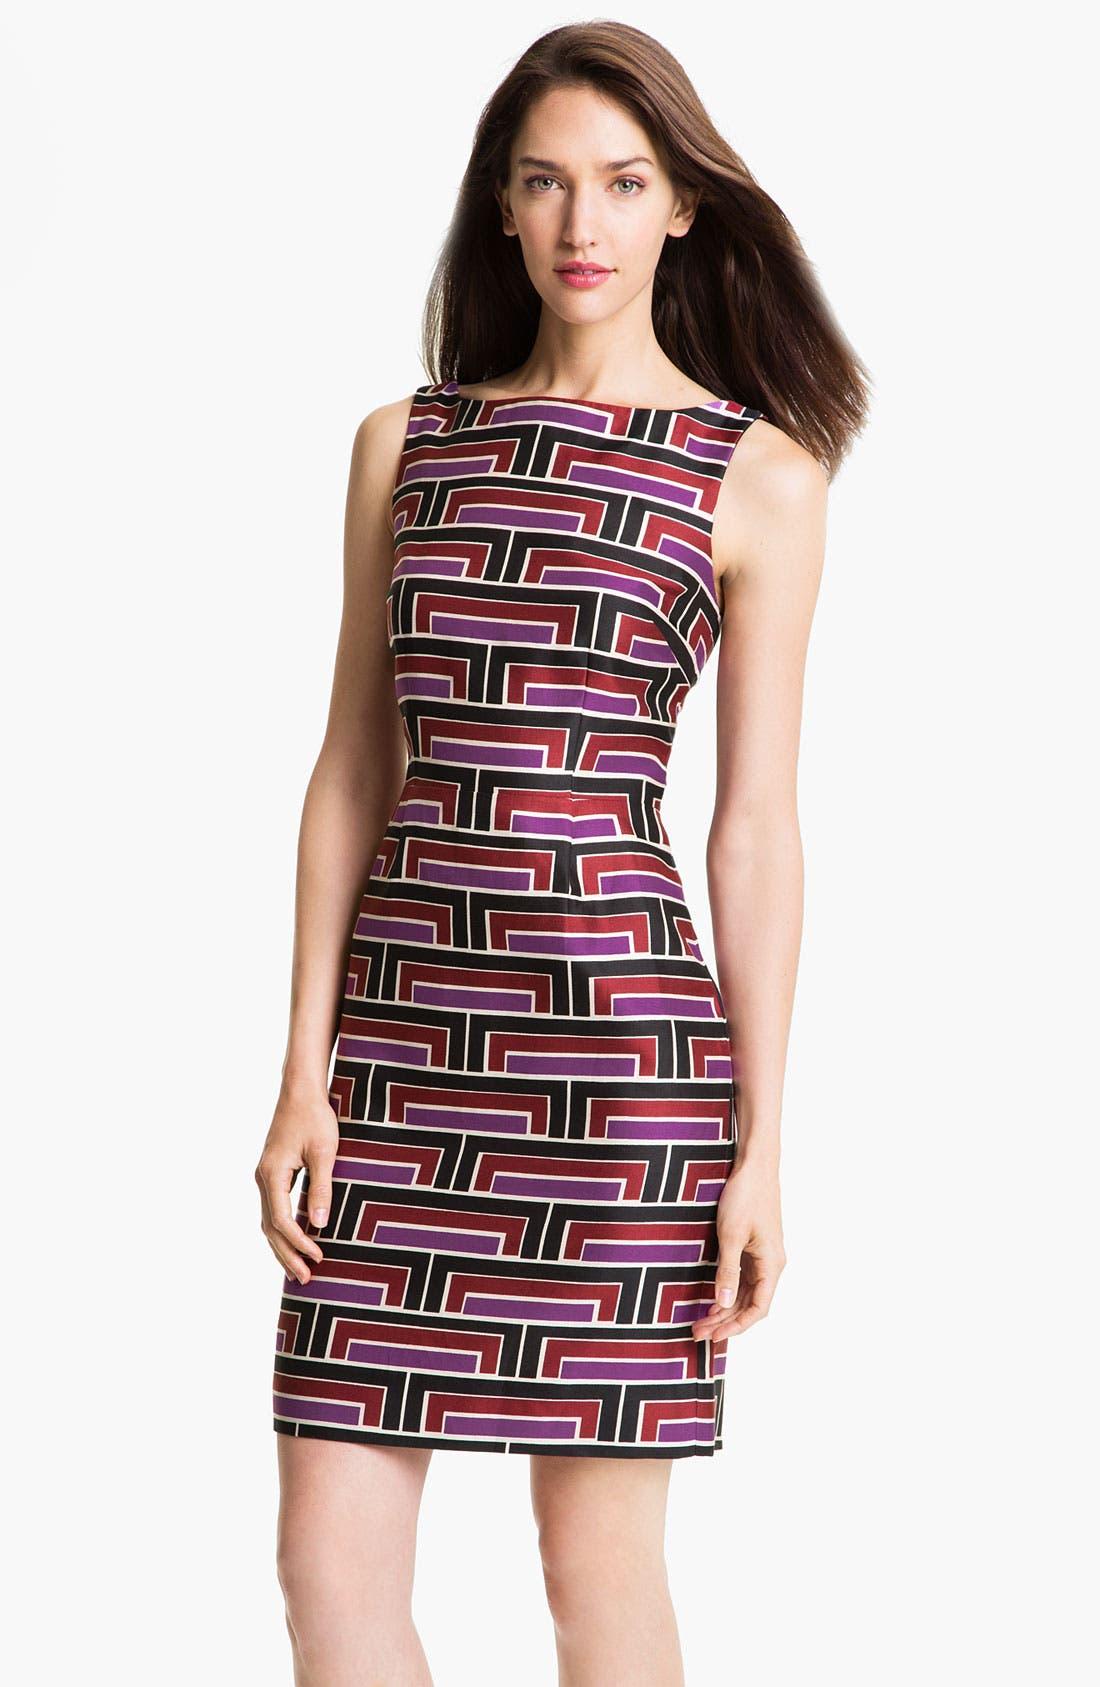 Alternate Image 1 Selected - kate spade new york 'purdy' cotton & silk sheath dress